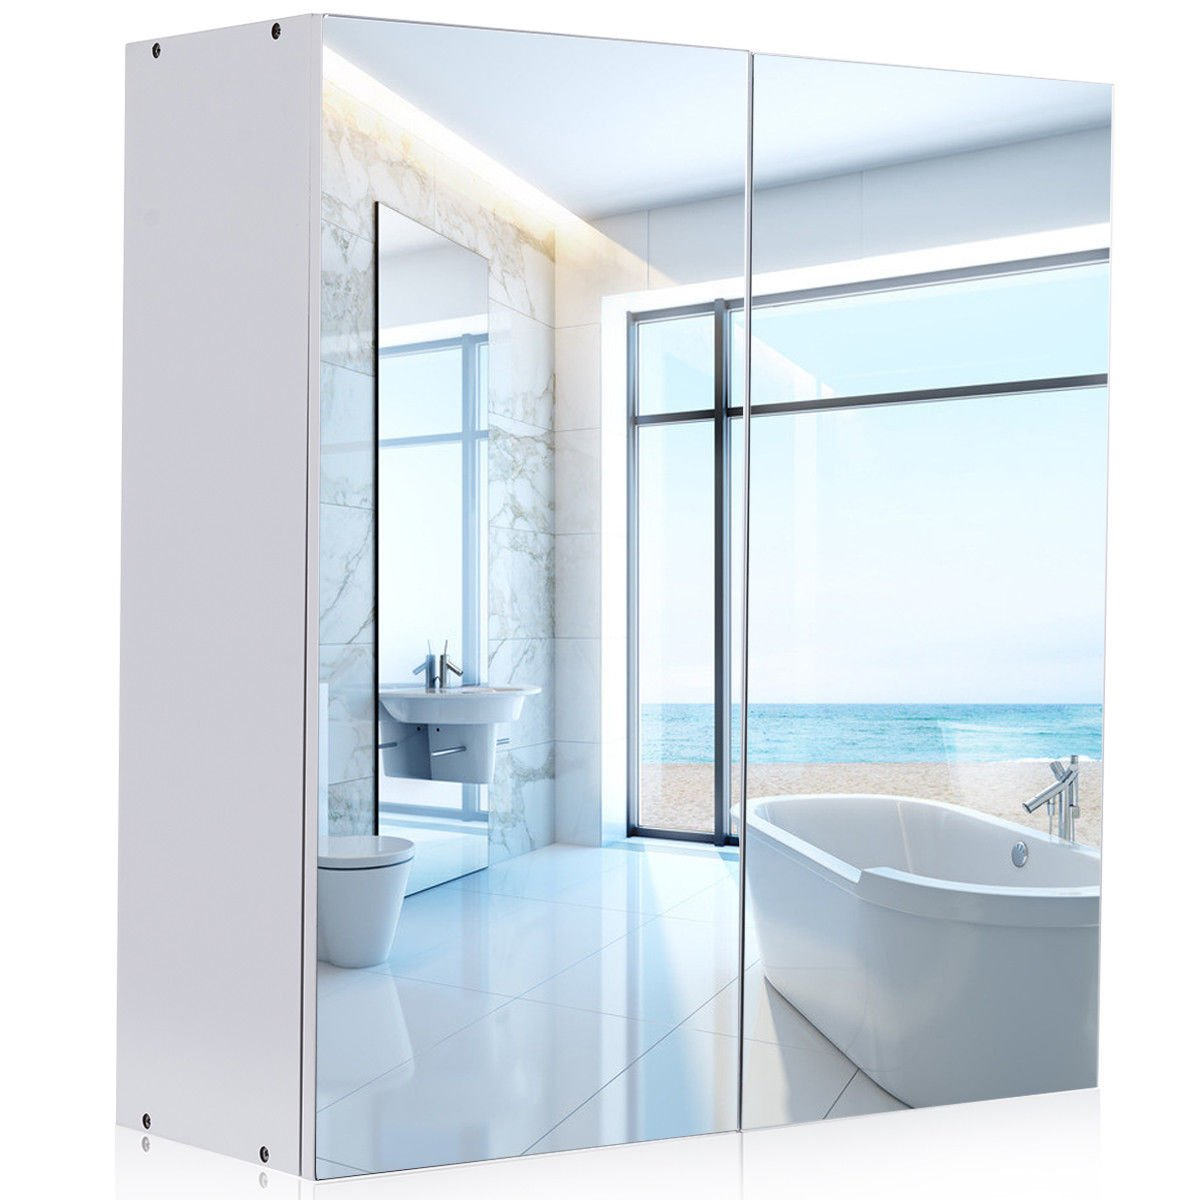 Amazon.com: TANGKULA Bathroom Cabinet Wall Mounted Mirrored Home ...